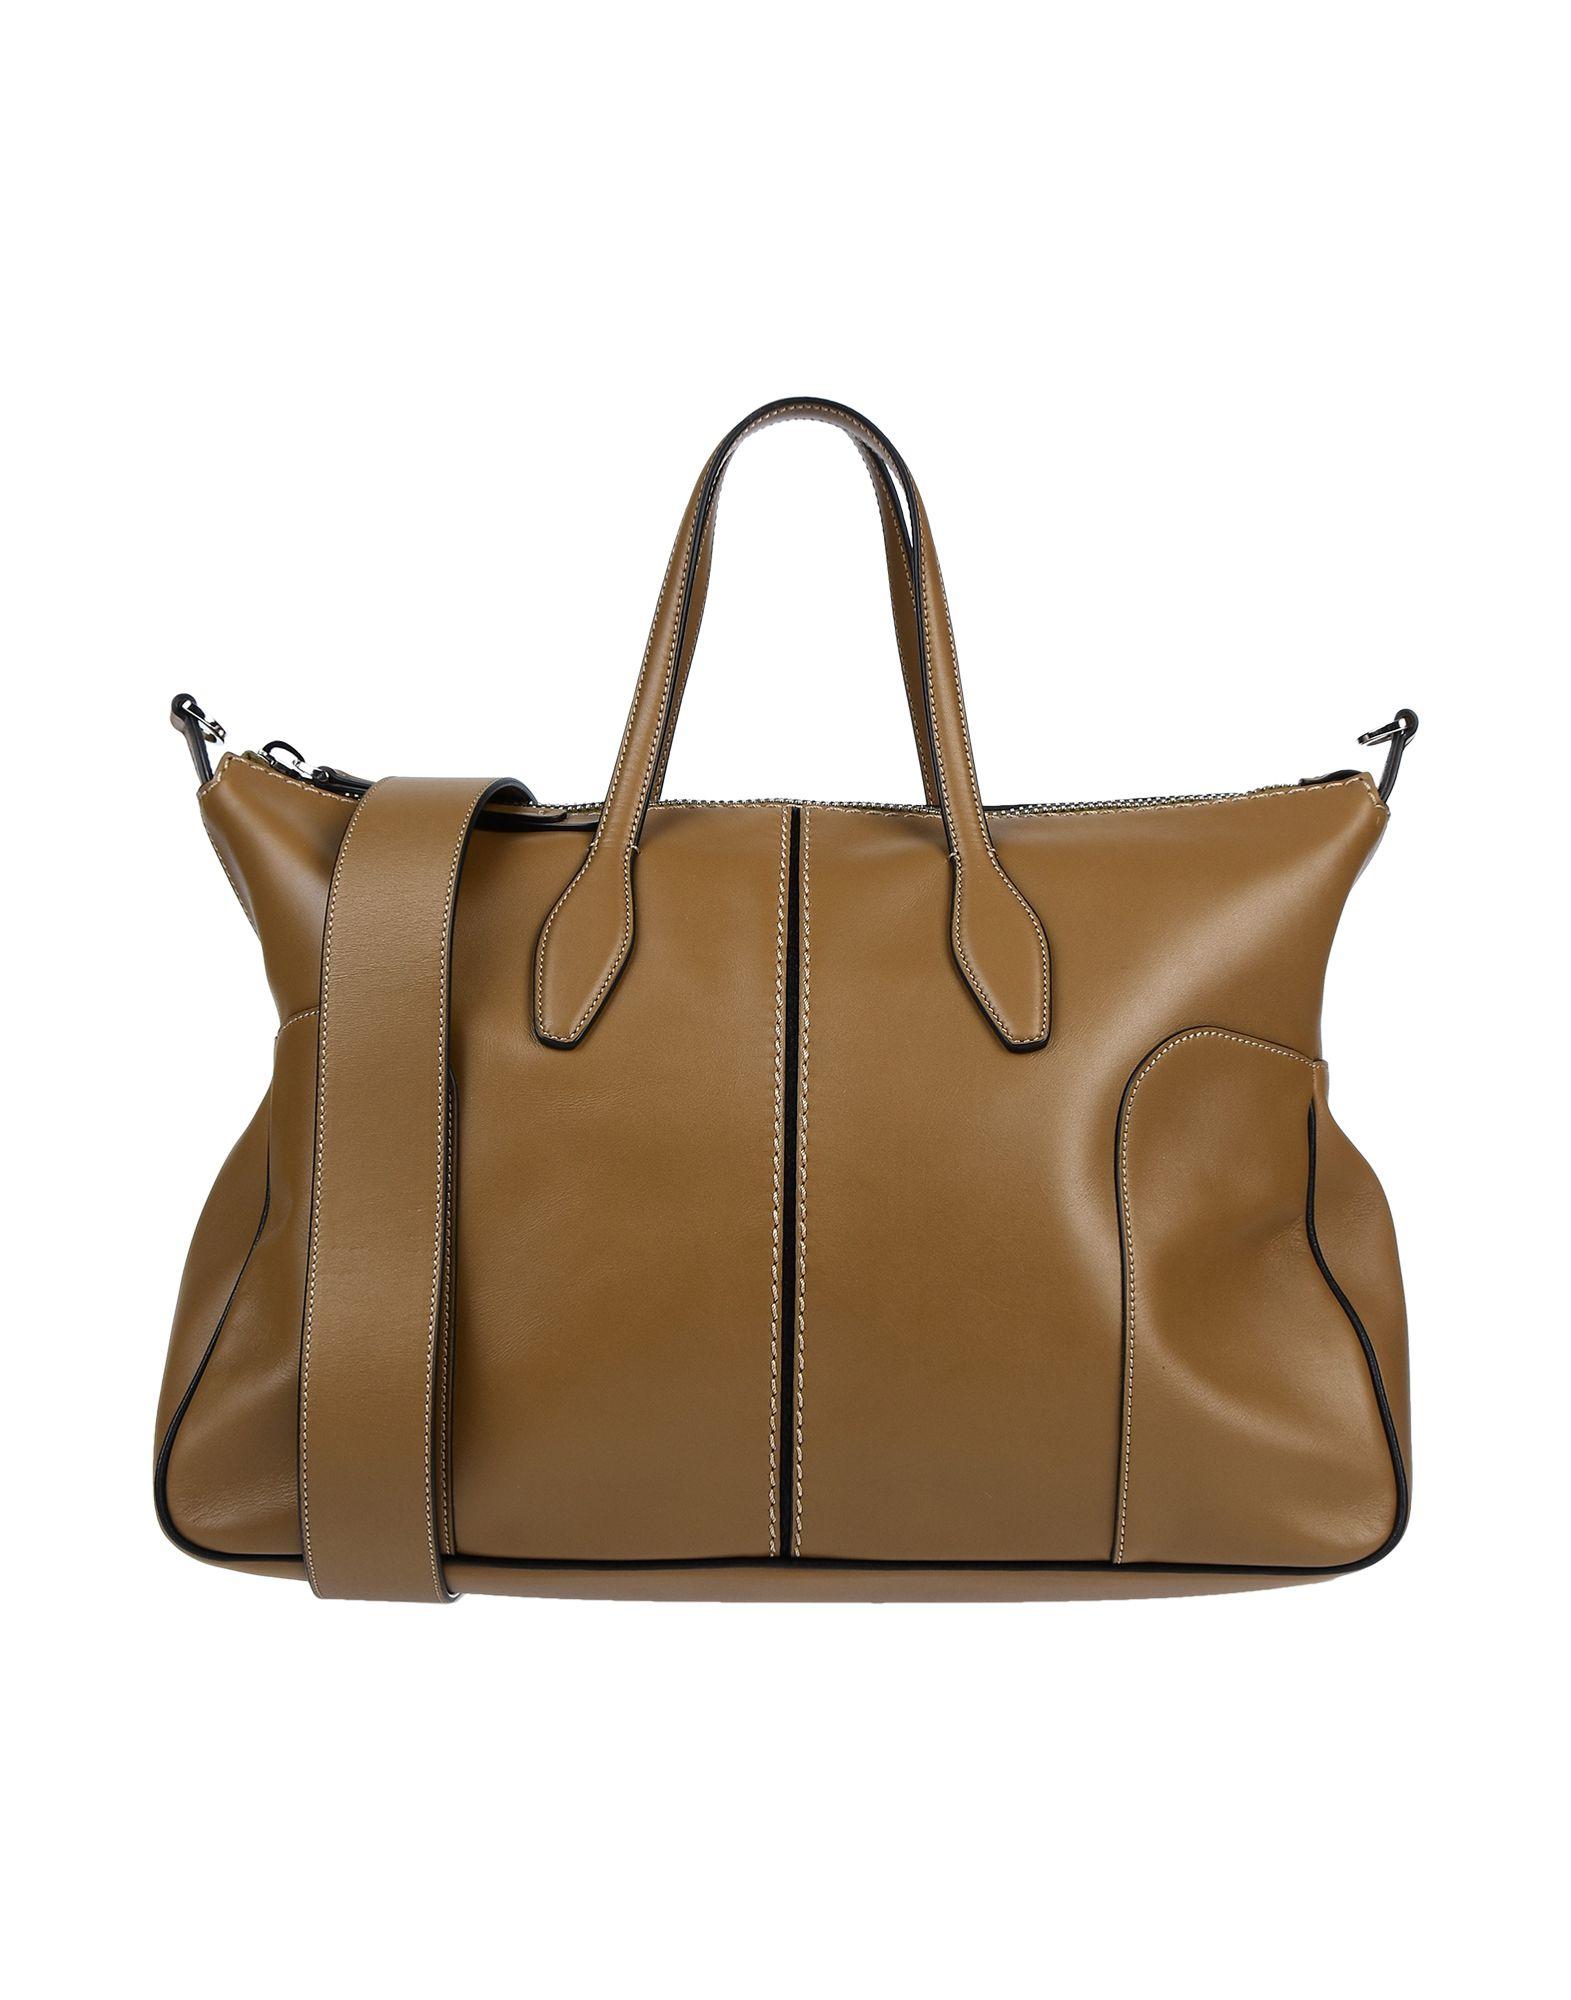 a613221812 Tod s Handbags - Tod s Women - YOOX United States